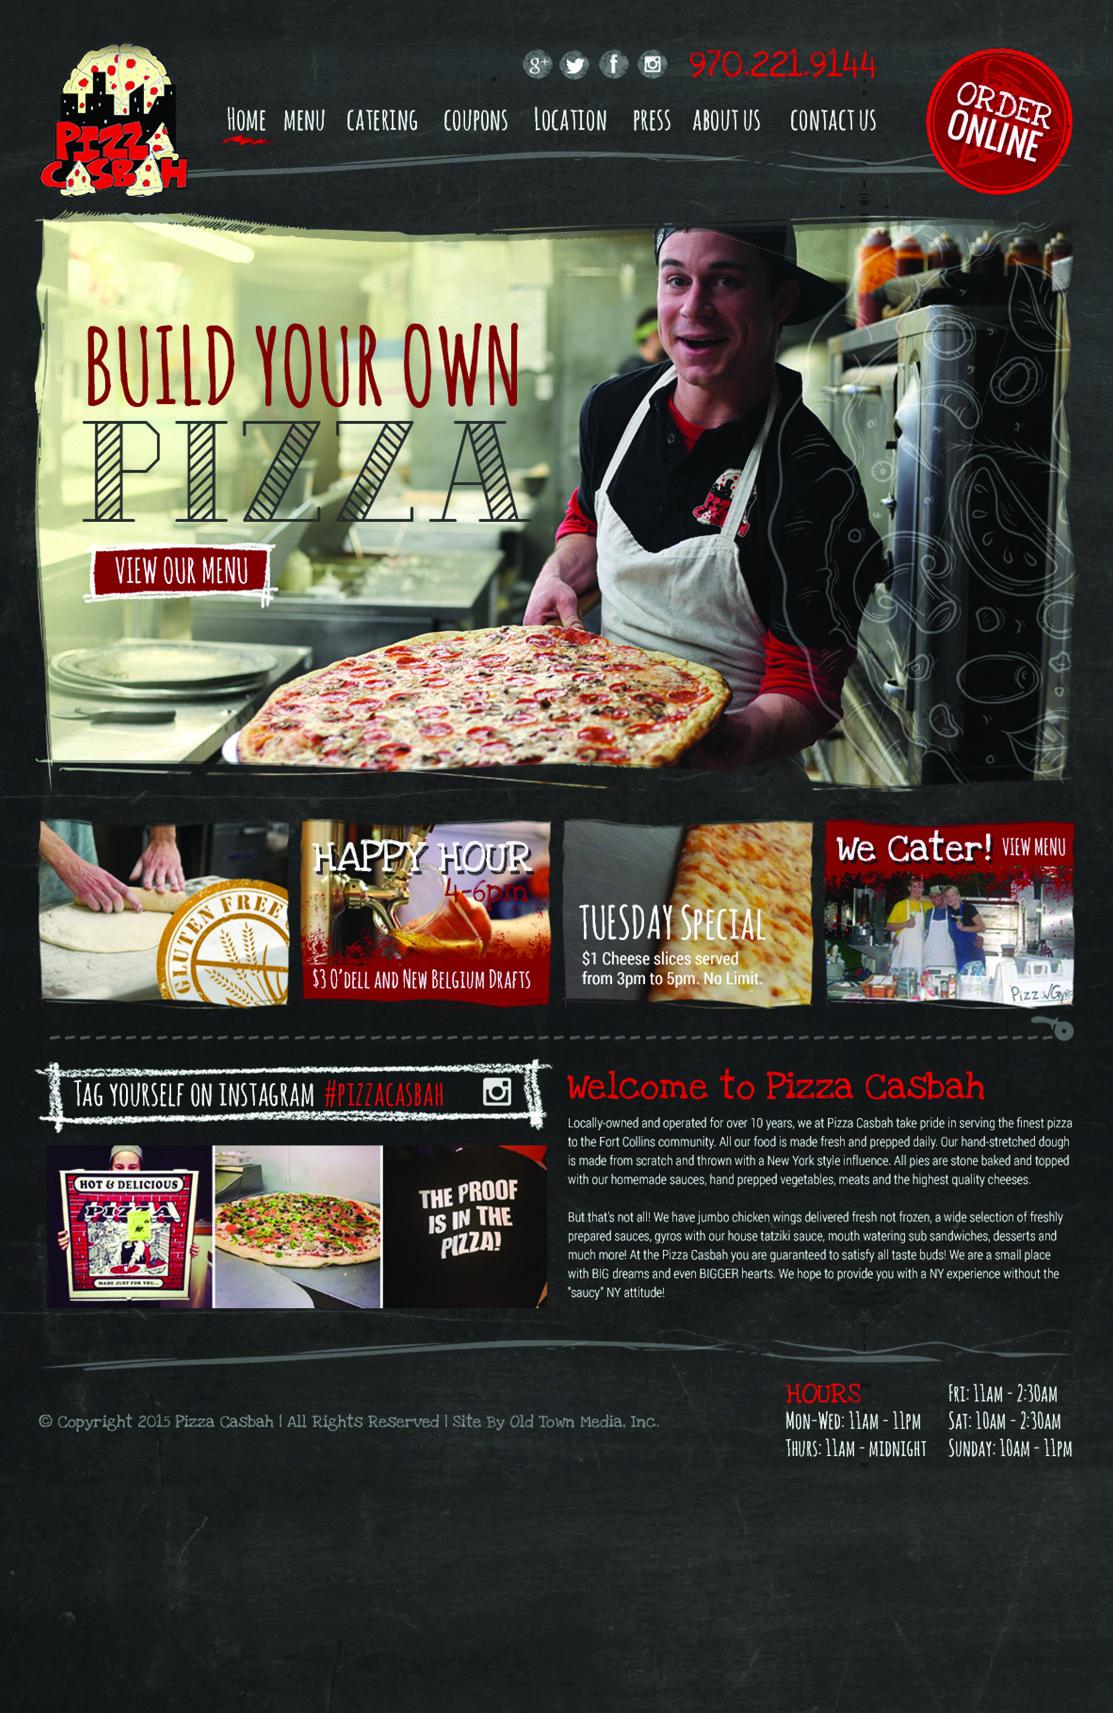 pizza casbah website design pizza website design website designs